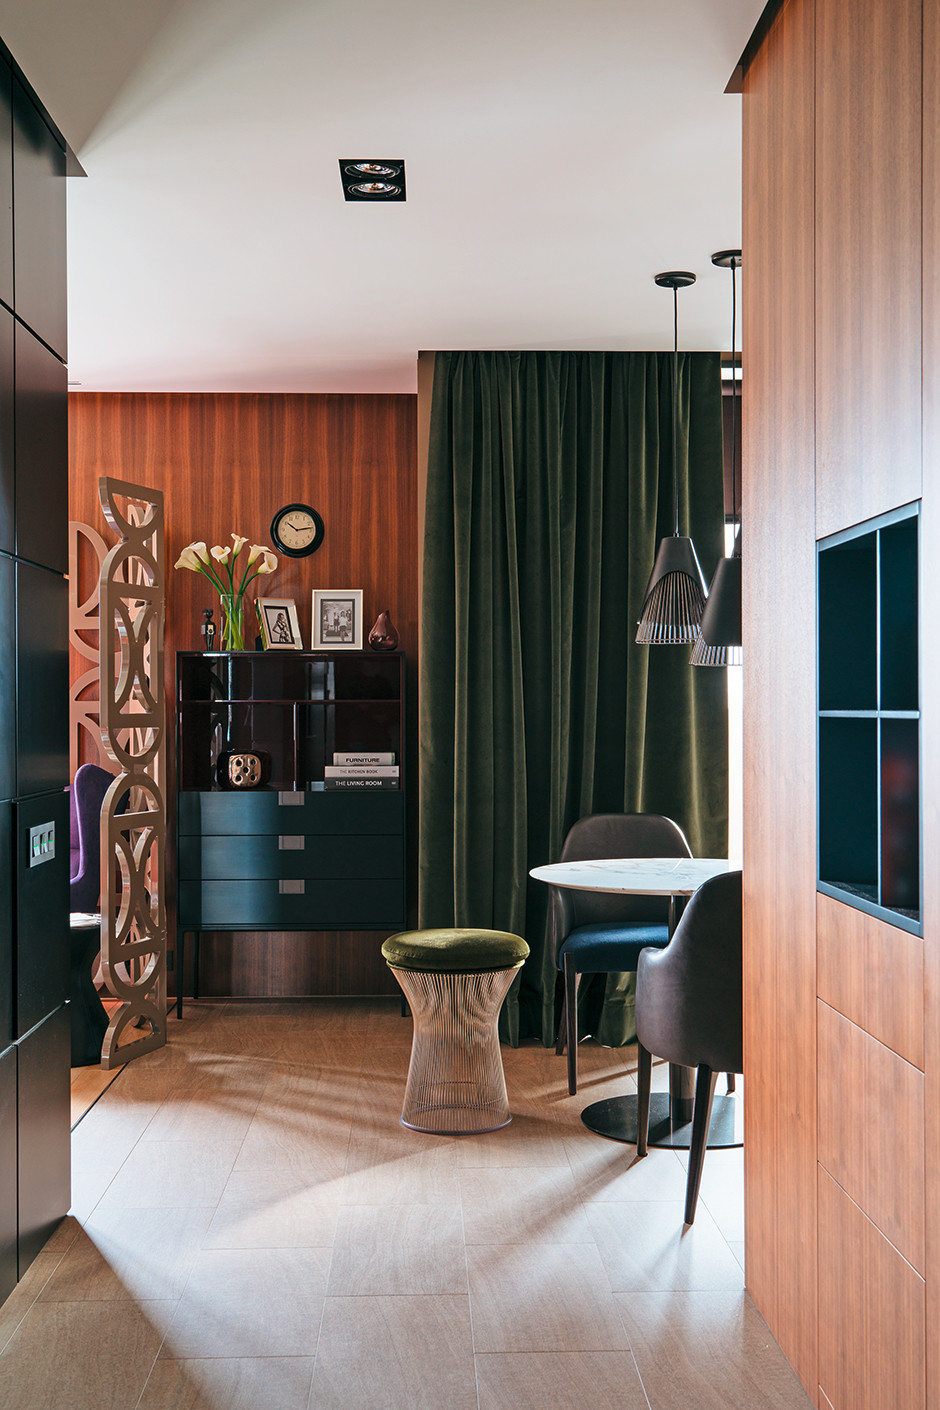 дизайн маленькой квартиры дизайн маленькой квартиры Дизайн маленькой квартиры  1 96f57b97c5844757d150cb305a19cafb  0xc0a839a4 3012316071485937606